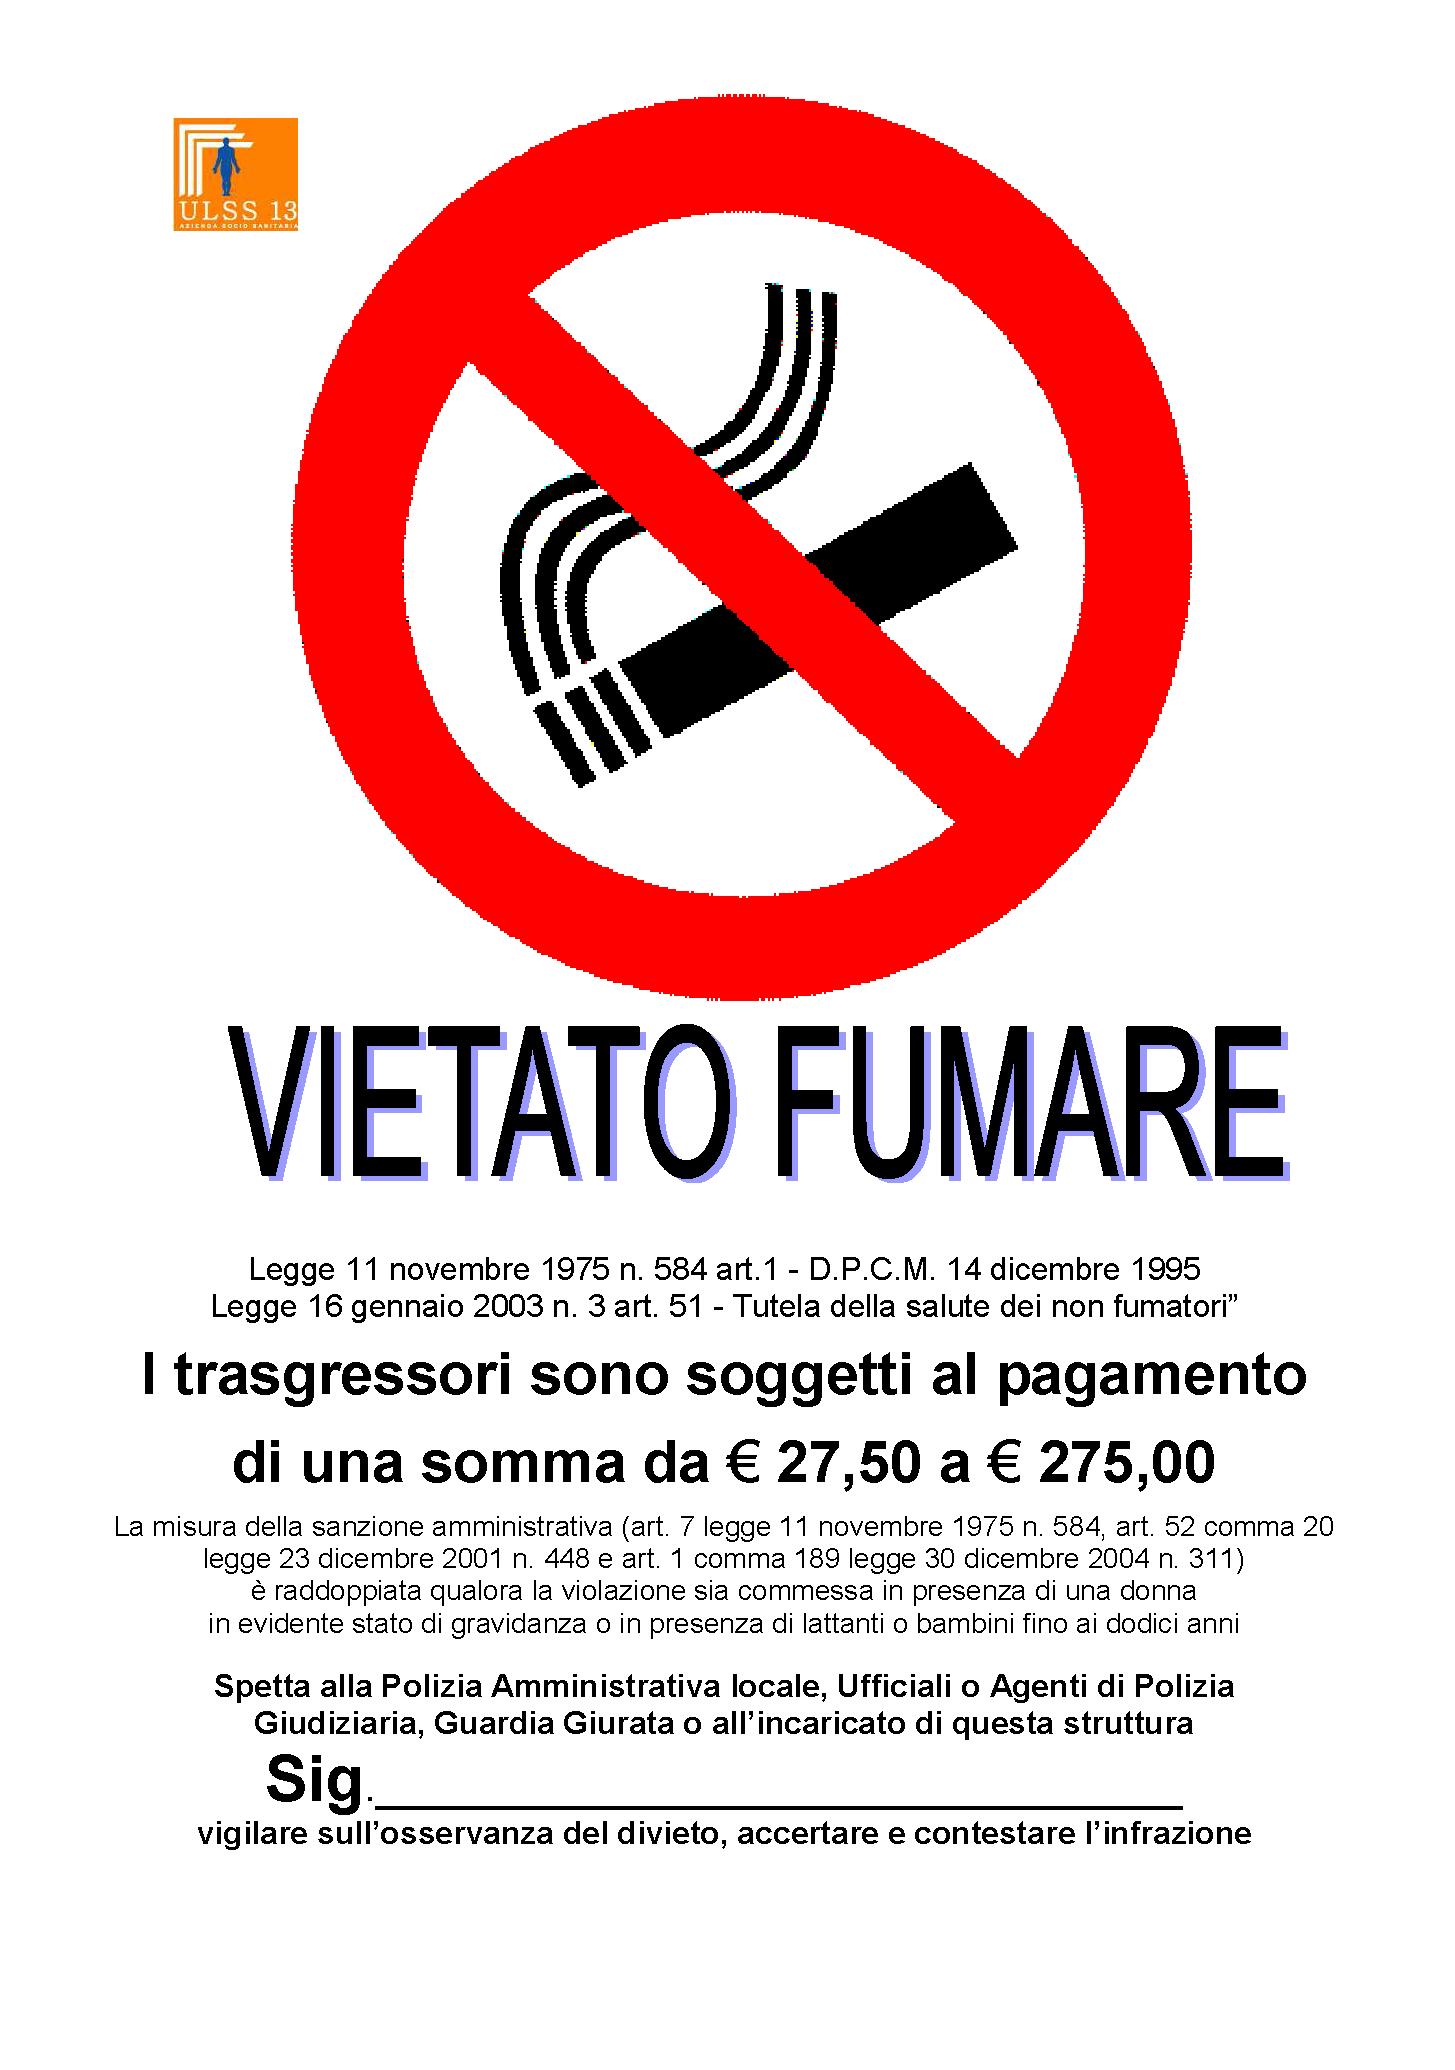 2015_vietato_fumare.jpg.png